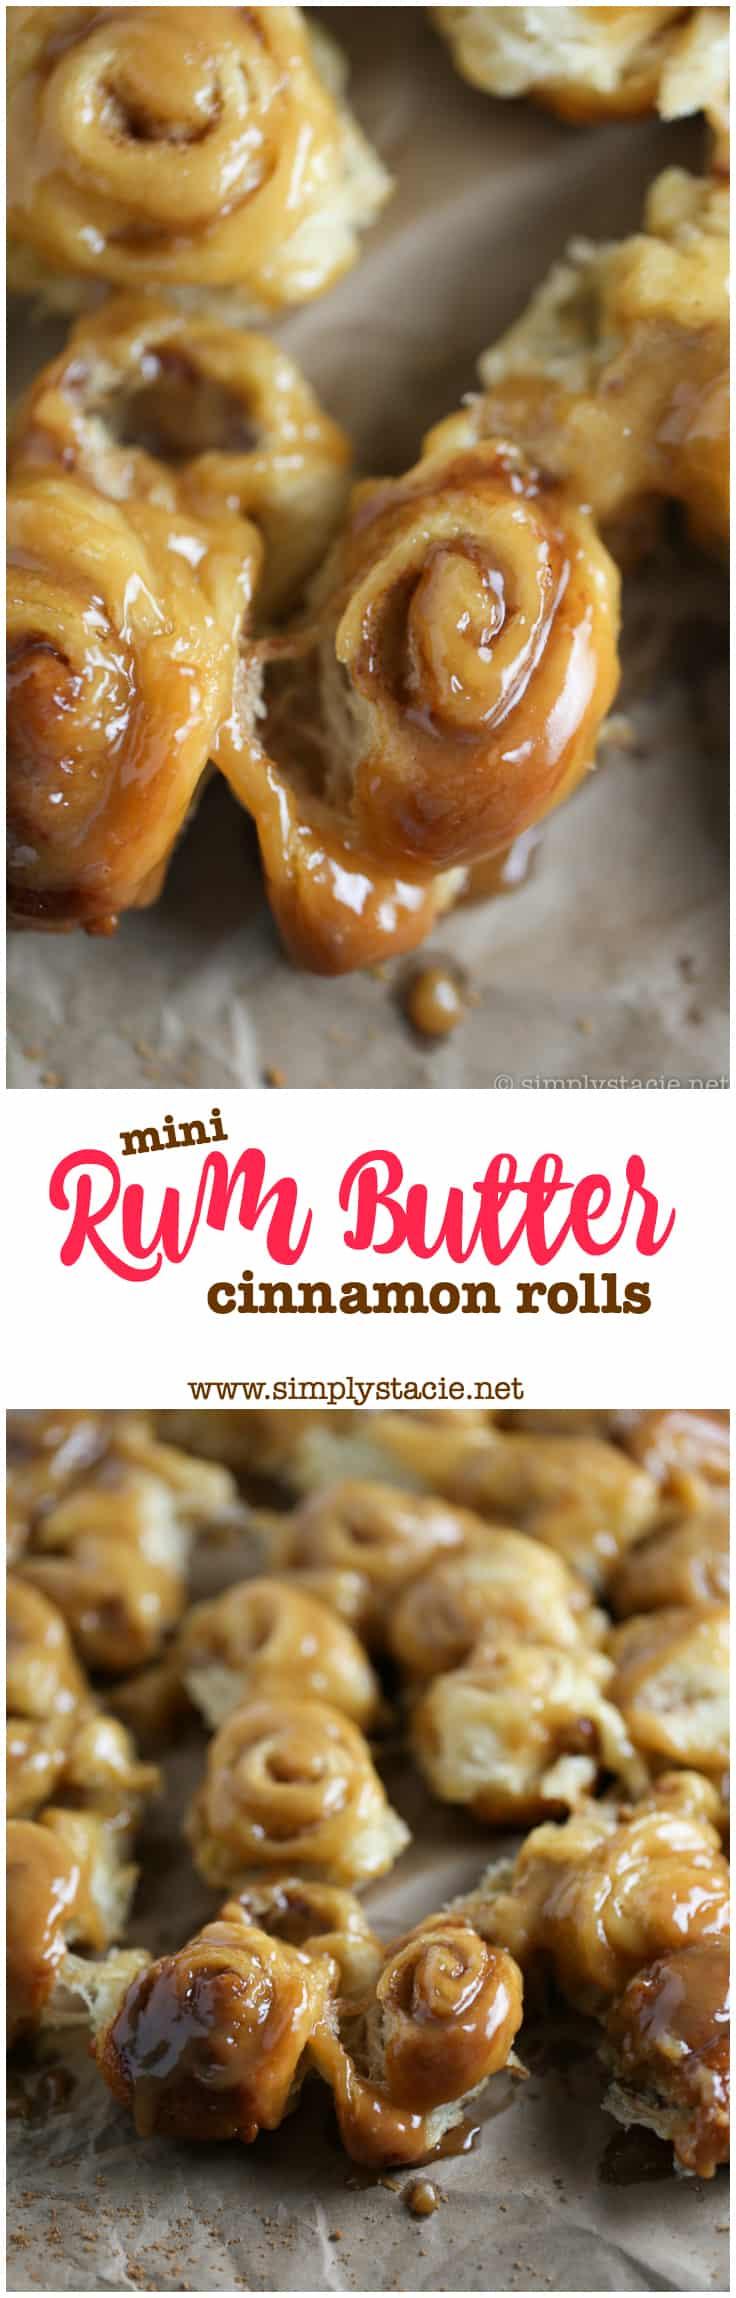 more cinnamon roll recipes, try my Cheesecake Stuffed Cinnamon Rolls ...